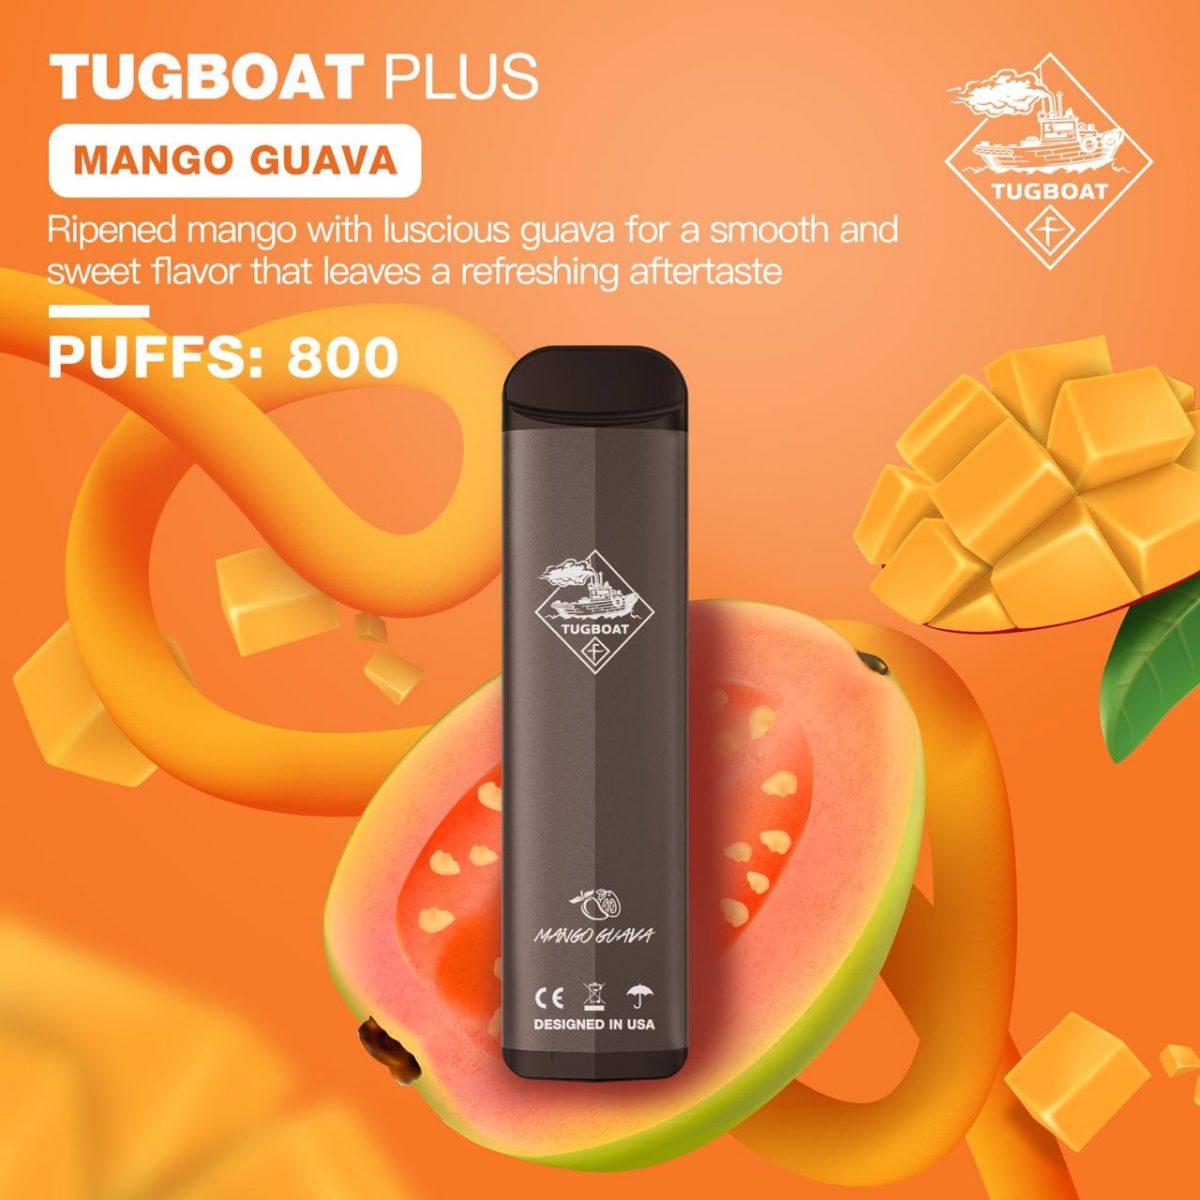 TUGBOAT PLUS MANGO GUAVA IN DUBAI/UAE